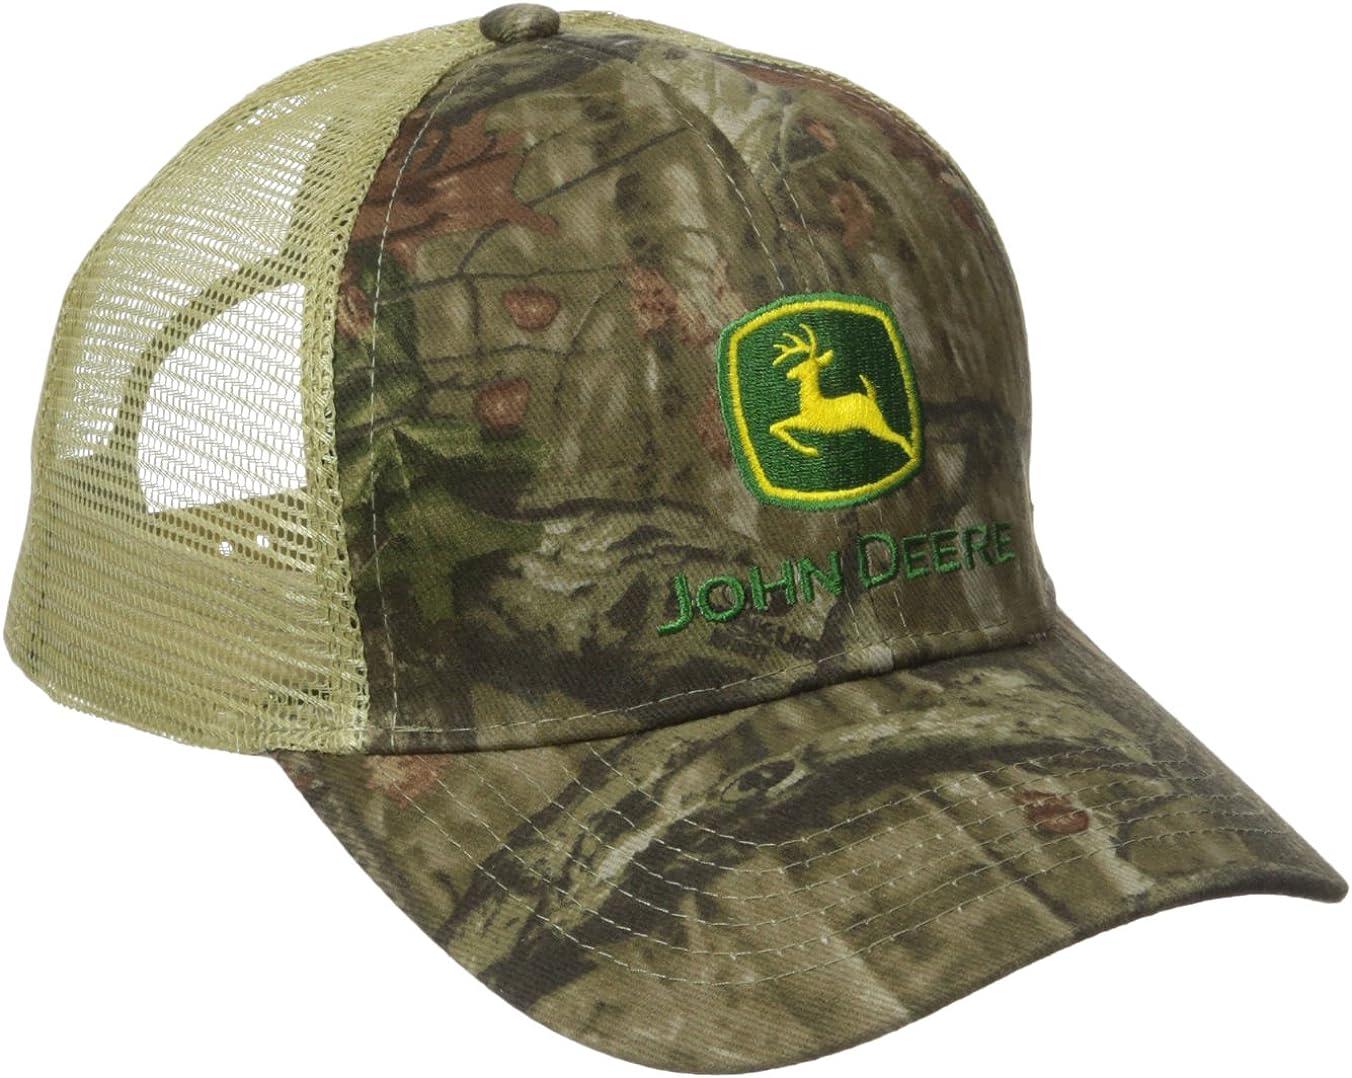 John Deere Mens Mossy Oak Mesh Back Cap